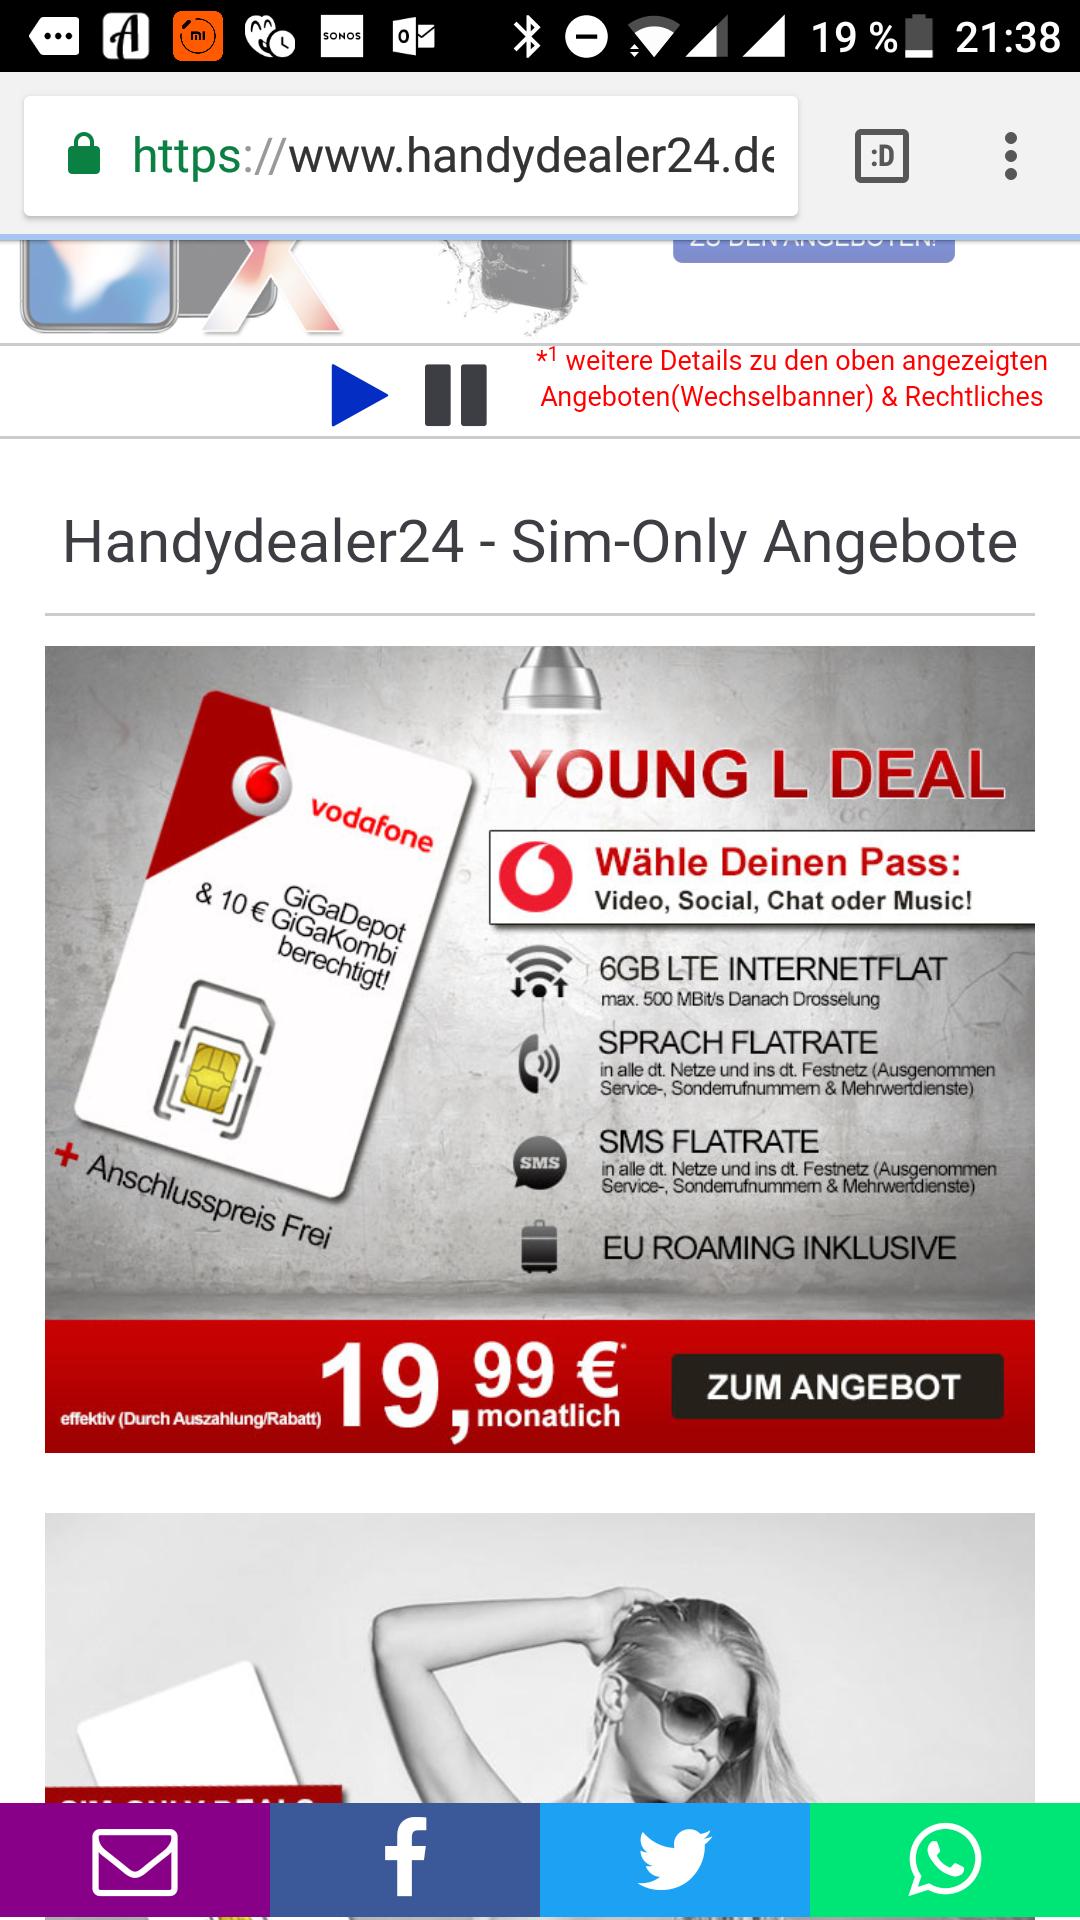 Vodafone Young L Tarif für 19,99€/Monat